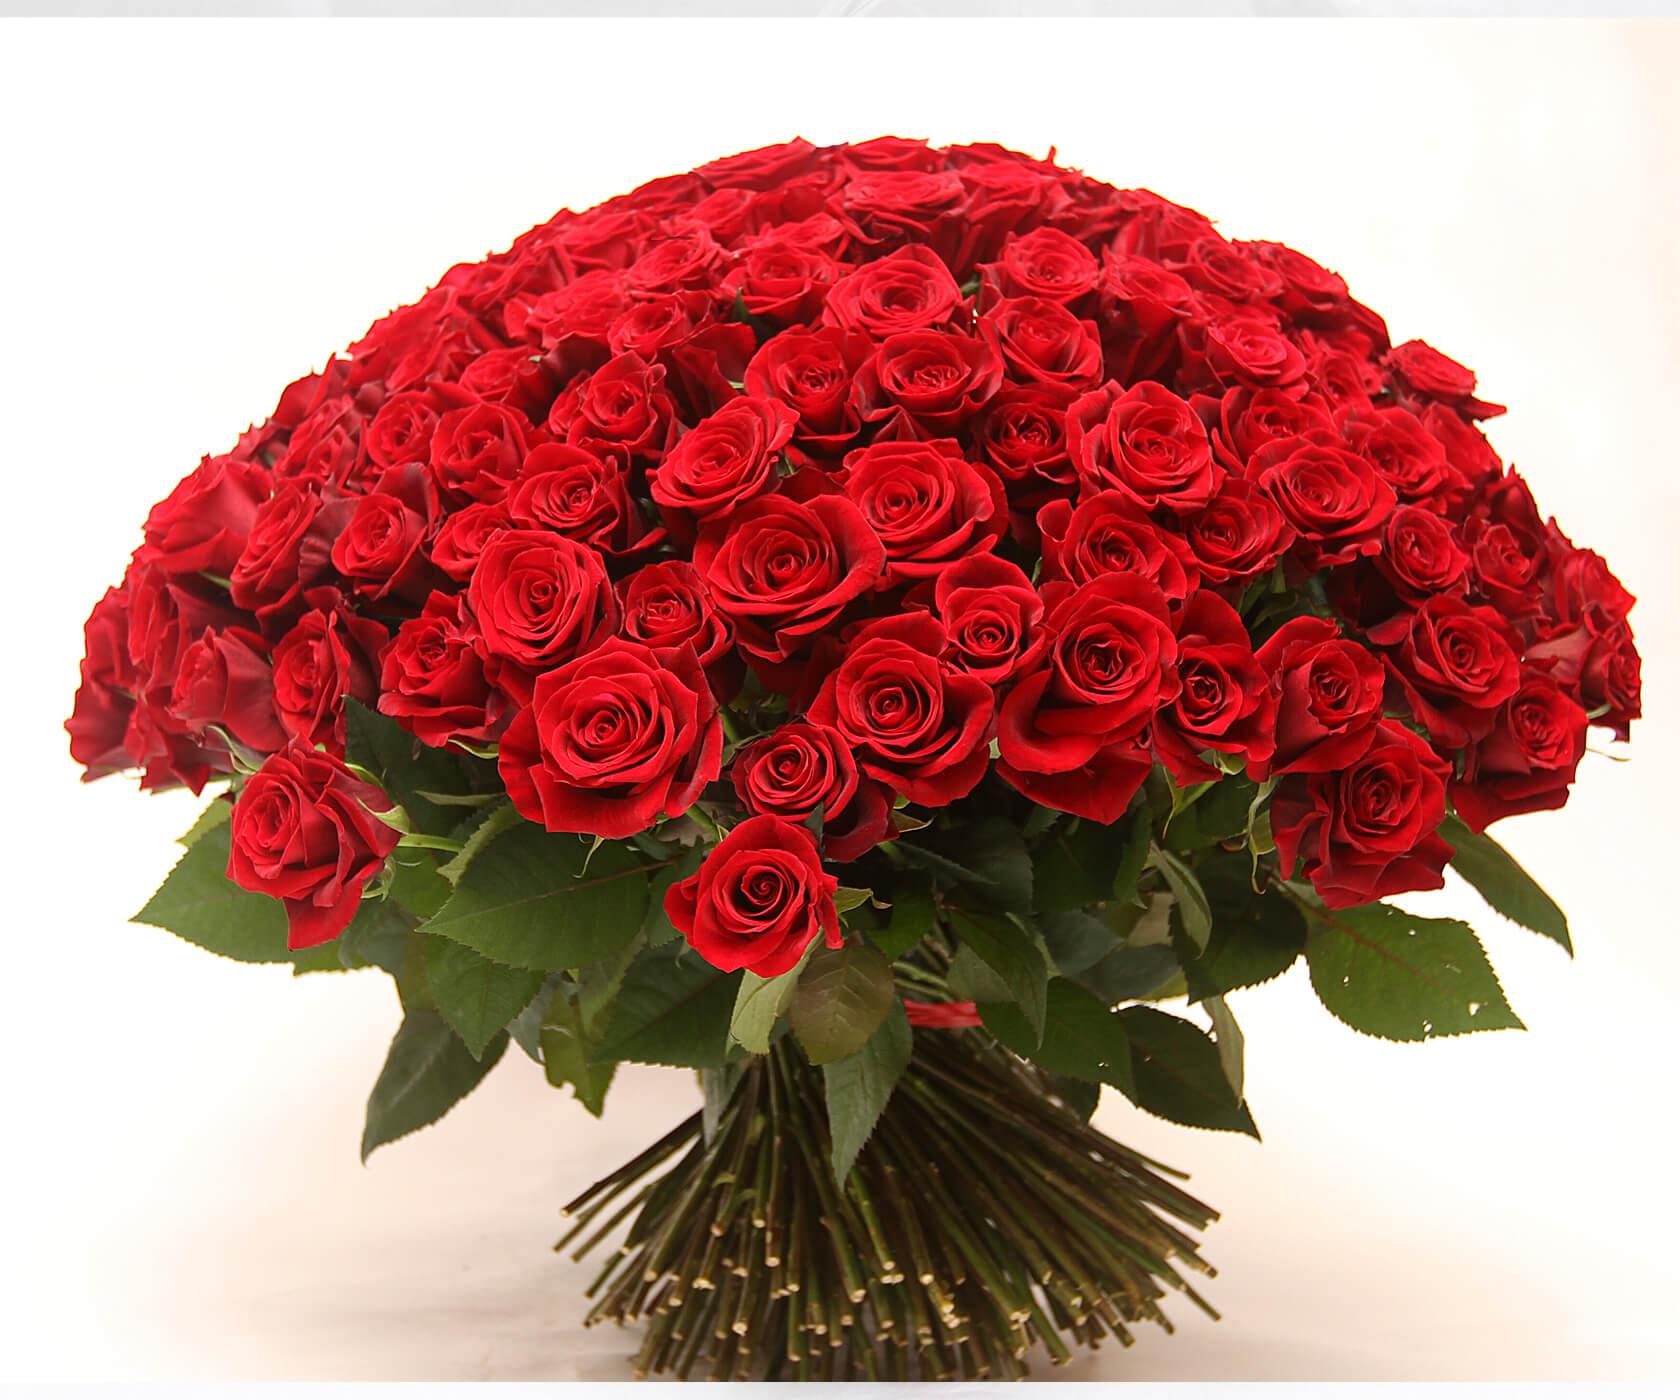 Красивые букеты алых роз картинки